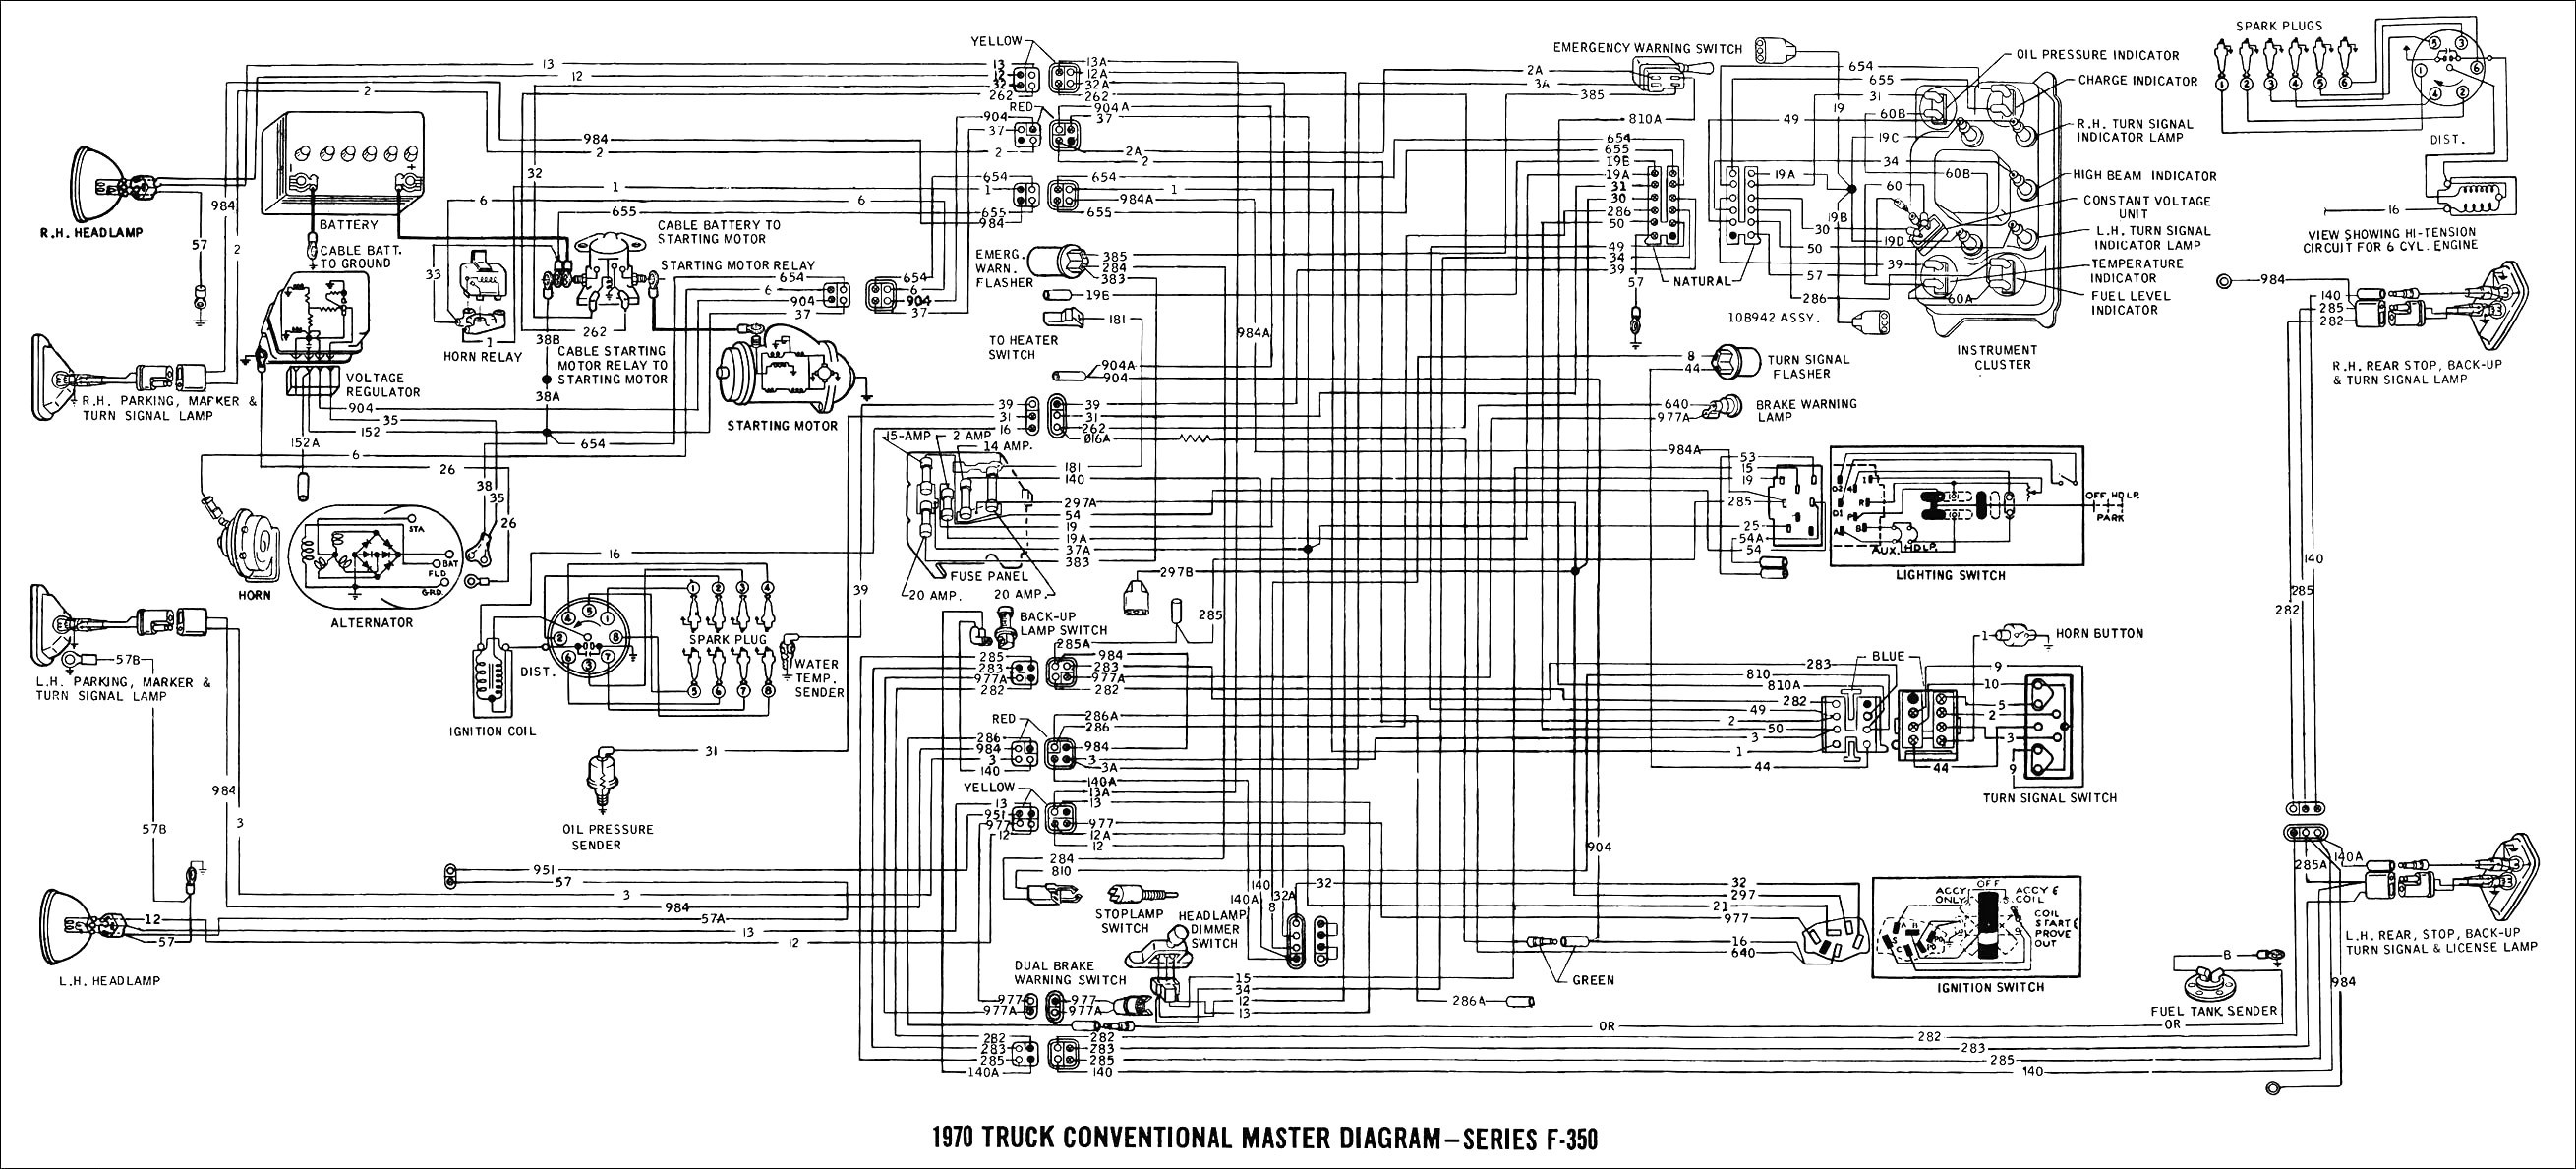 Ford Ranger Wiring Harness Diagram 2001 ford Ranger Starter Wiring Diagram Inspirational 1999 ford Of Ford Ranger Wiring Harness Diagram